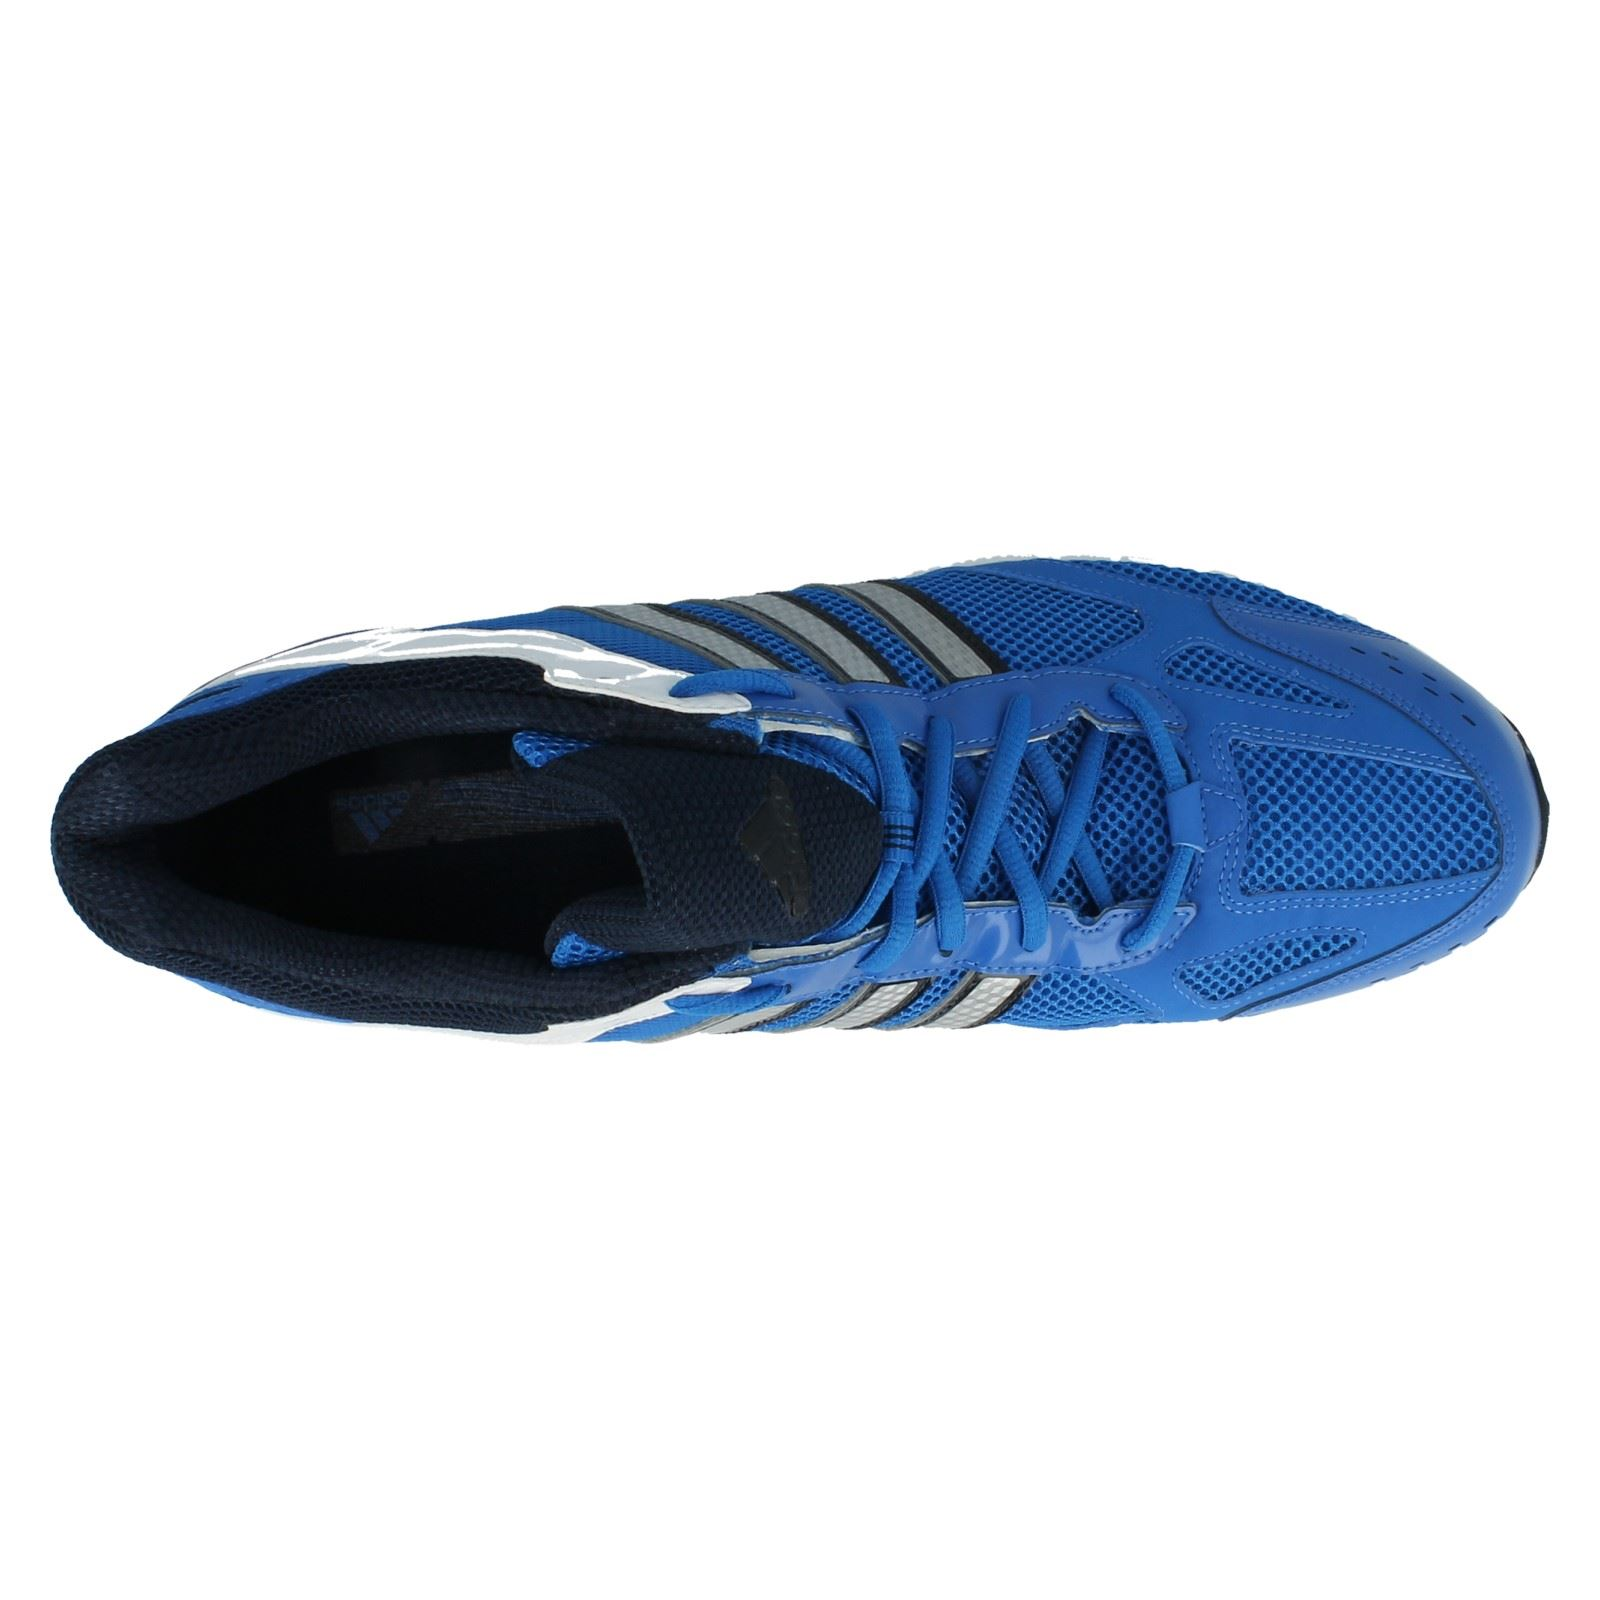 Priblue duramo Trainers Adidas 4m Mt Style Silv Mens Black1 x4XqSwUxn